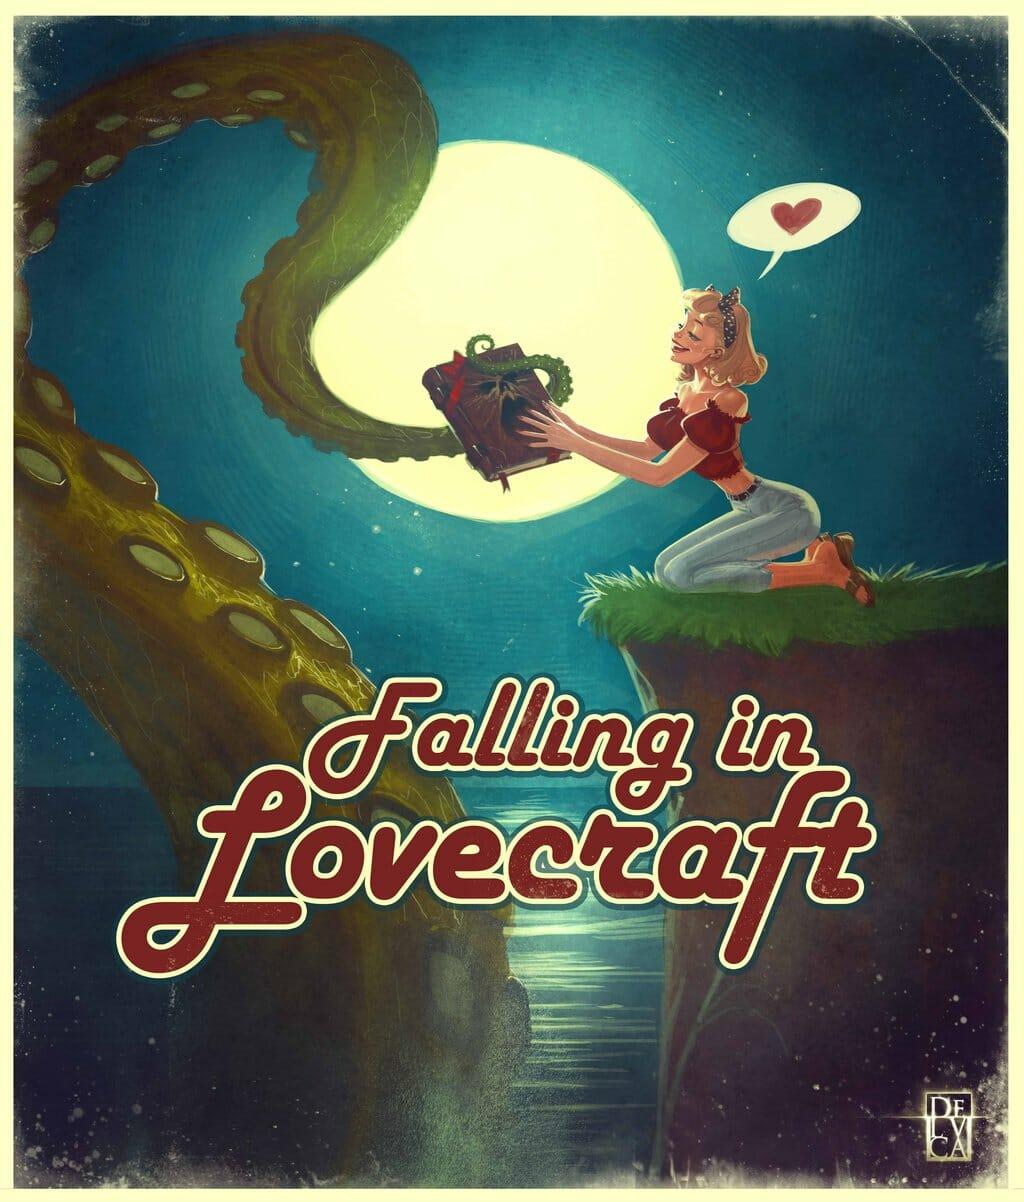 falling_in_lovecraft_by_antoniodeluca-d7plr42